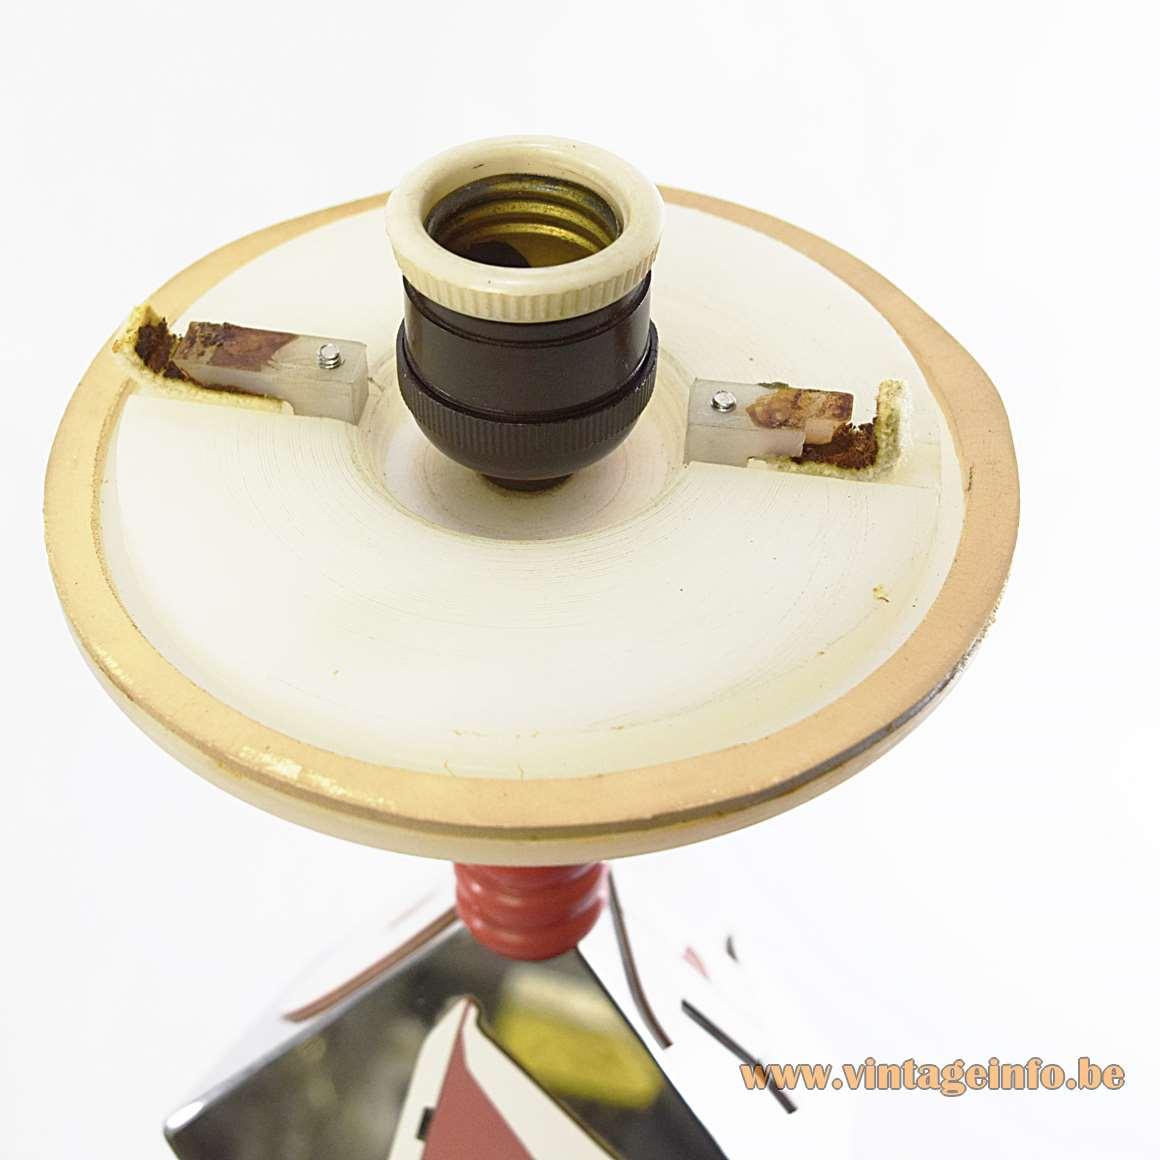 Diamond Cutting Early Retirement Table Lamp - socket